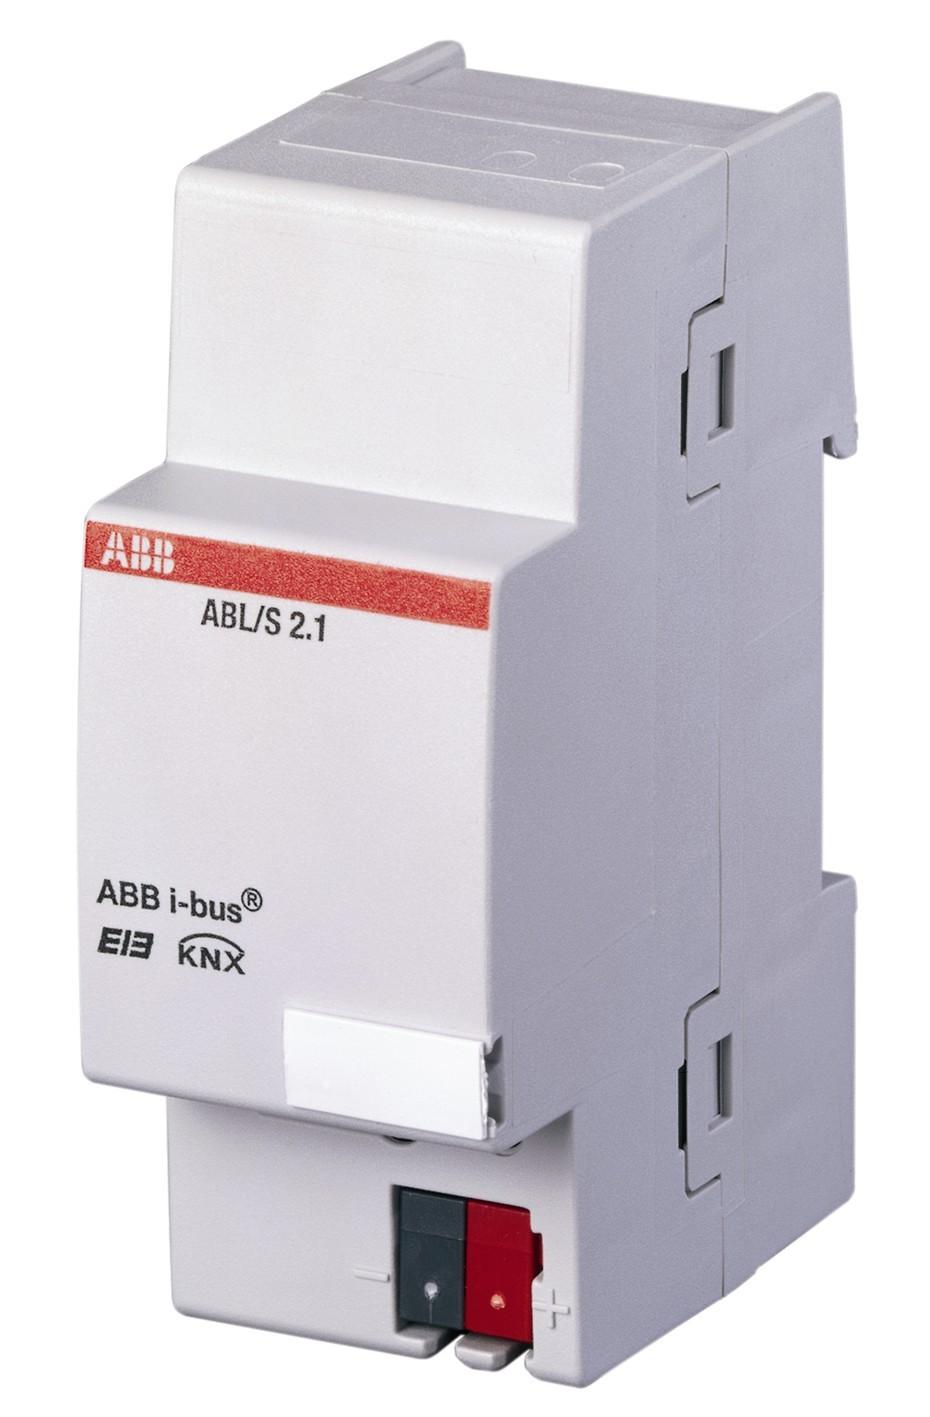 ABB Applikationsbaustein Logik ABL/S 2.1 2CDG110073R0011